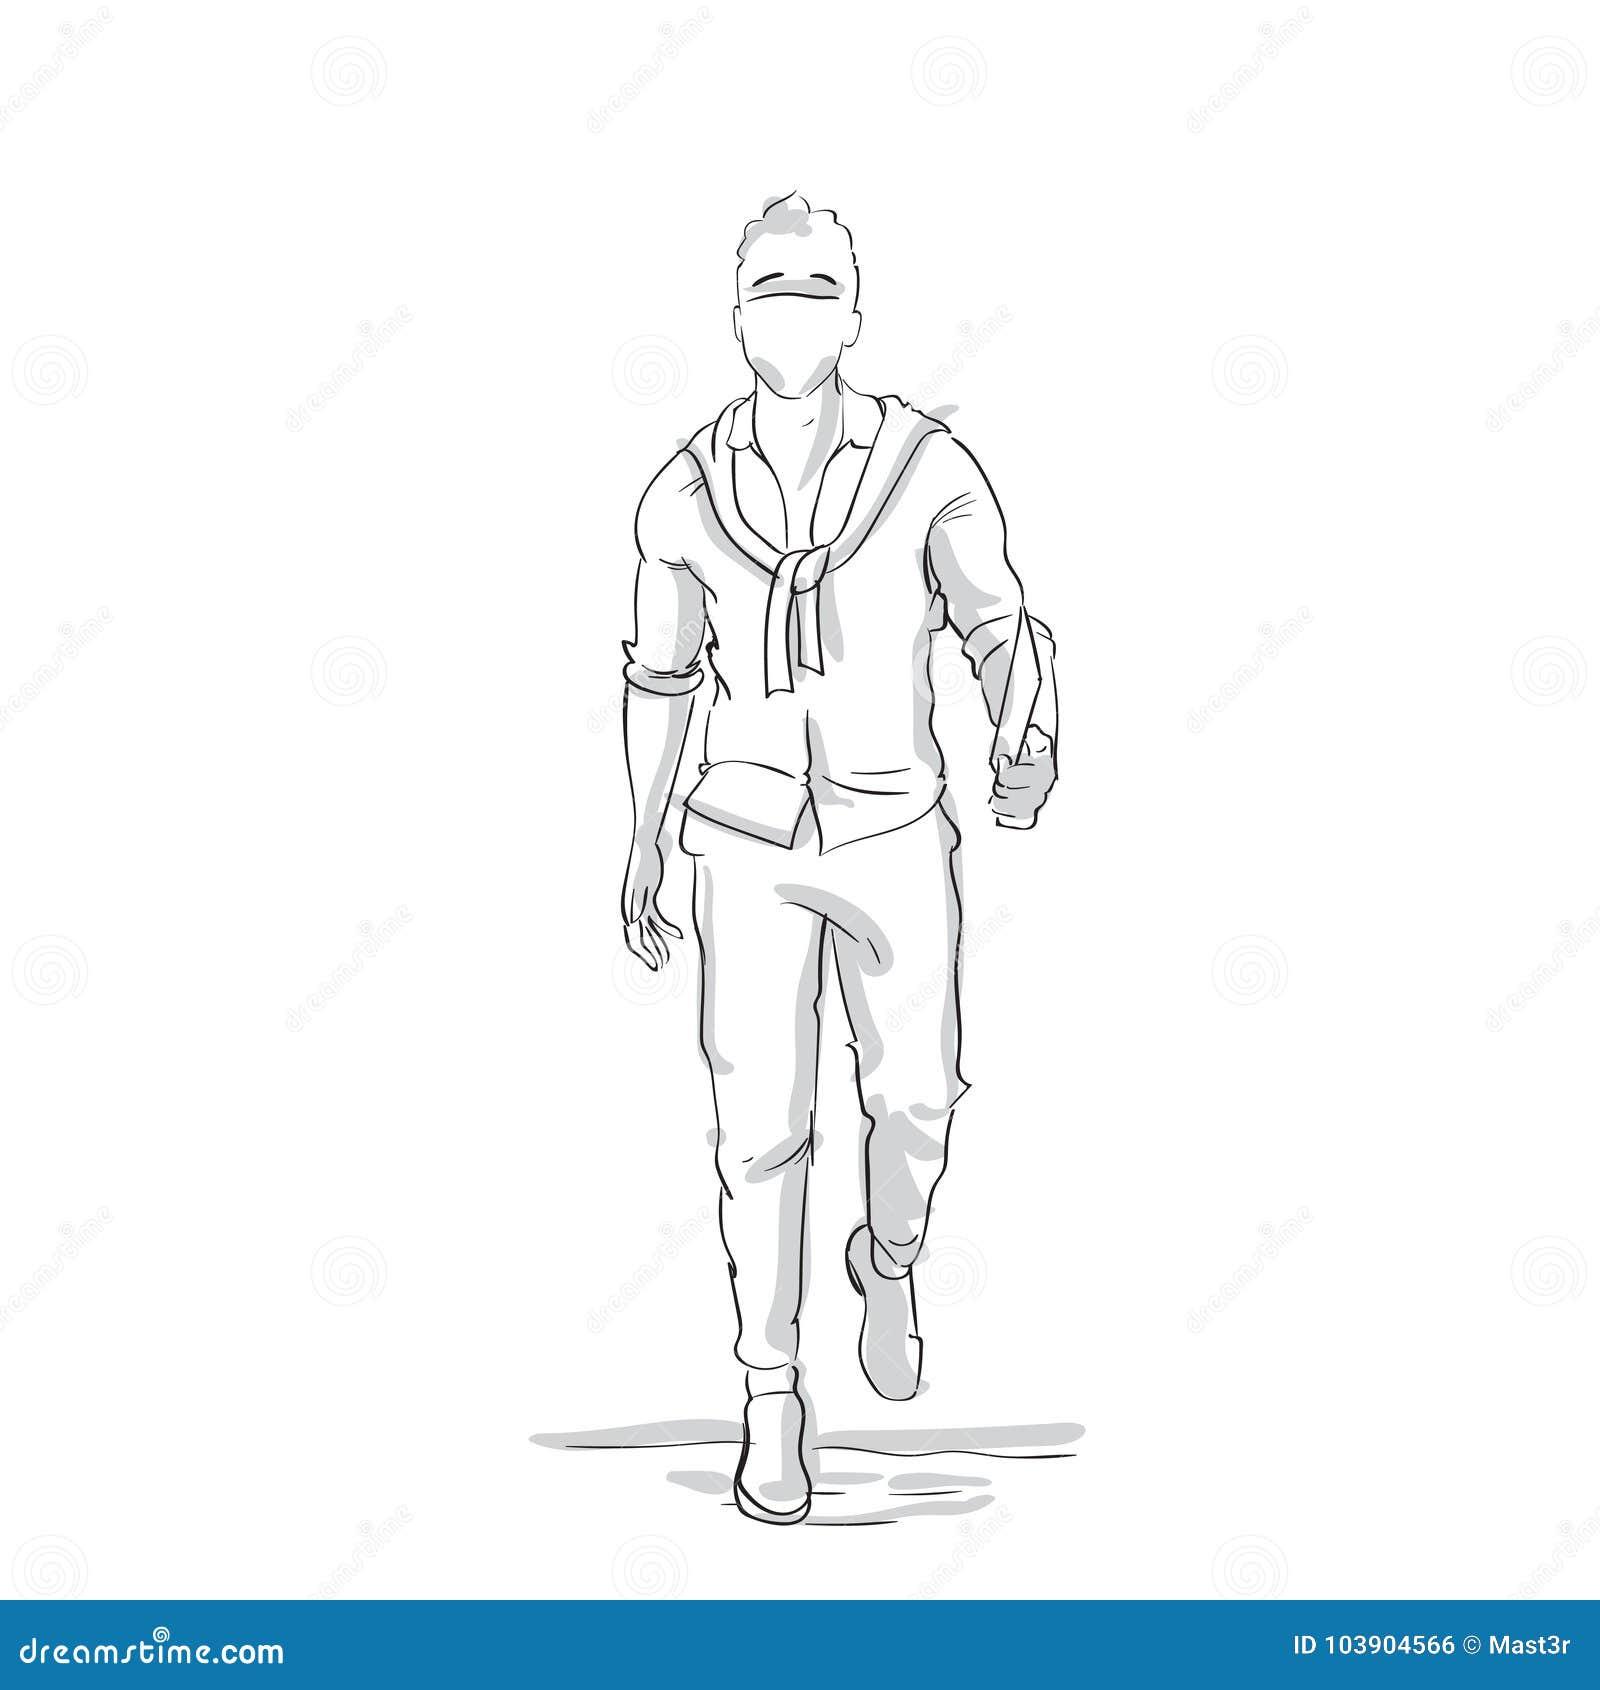 Businessman silhouette walking forward sketch business man full length figure on white background